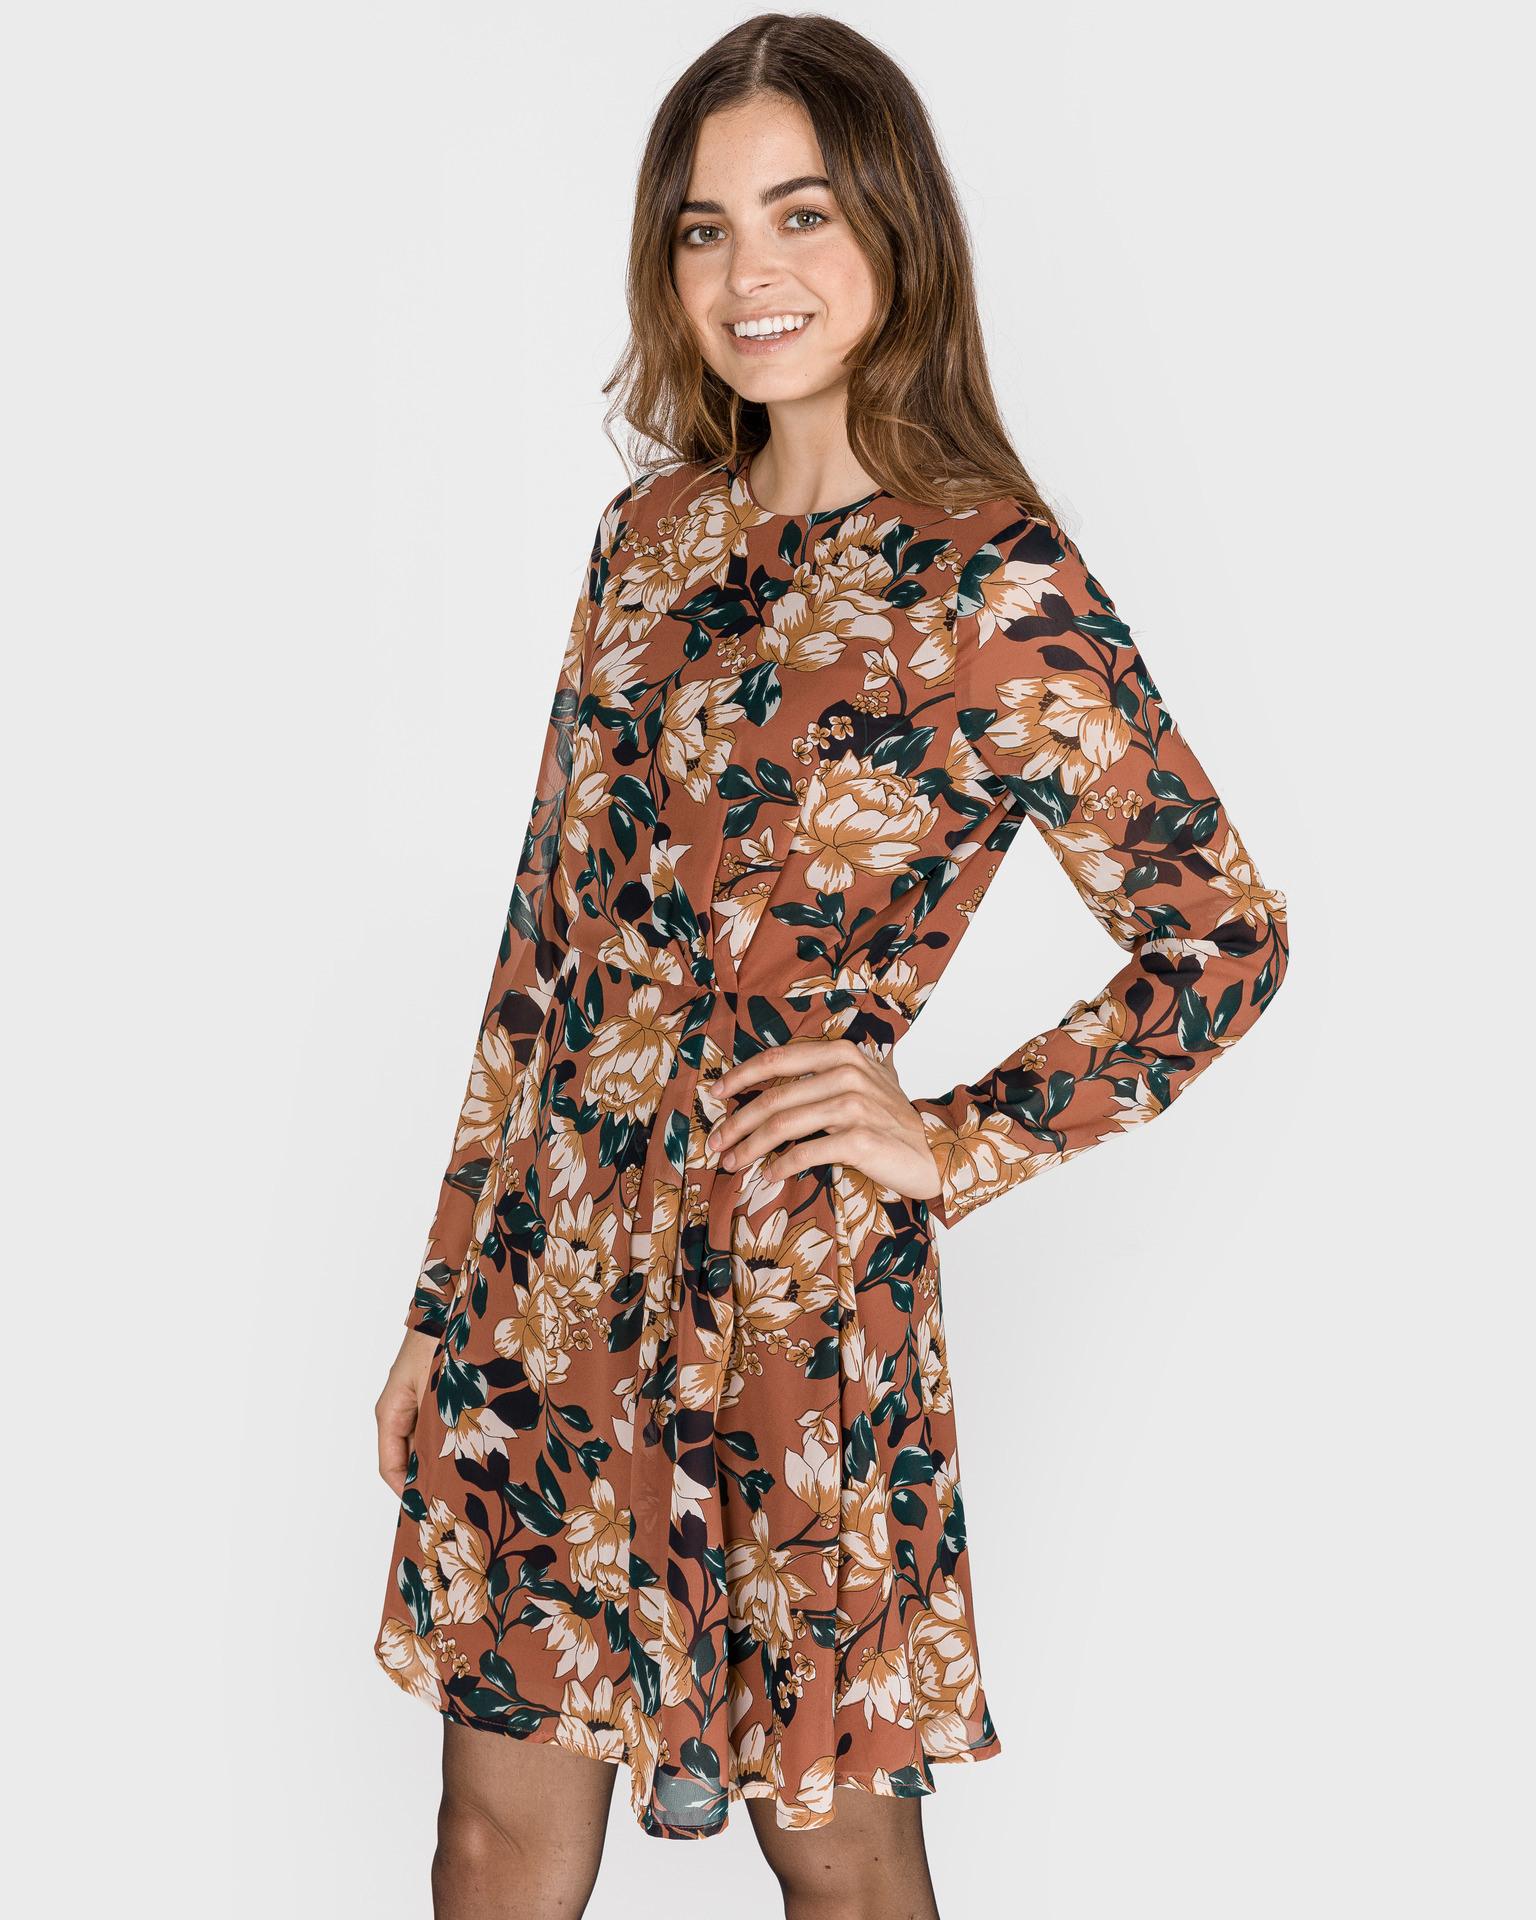 Designer Top Abendkleid Vero Moda ÄrmelAbend Genial Abendkleid Vero Moda Stylish